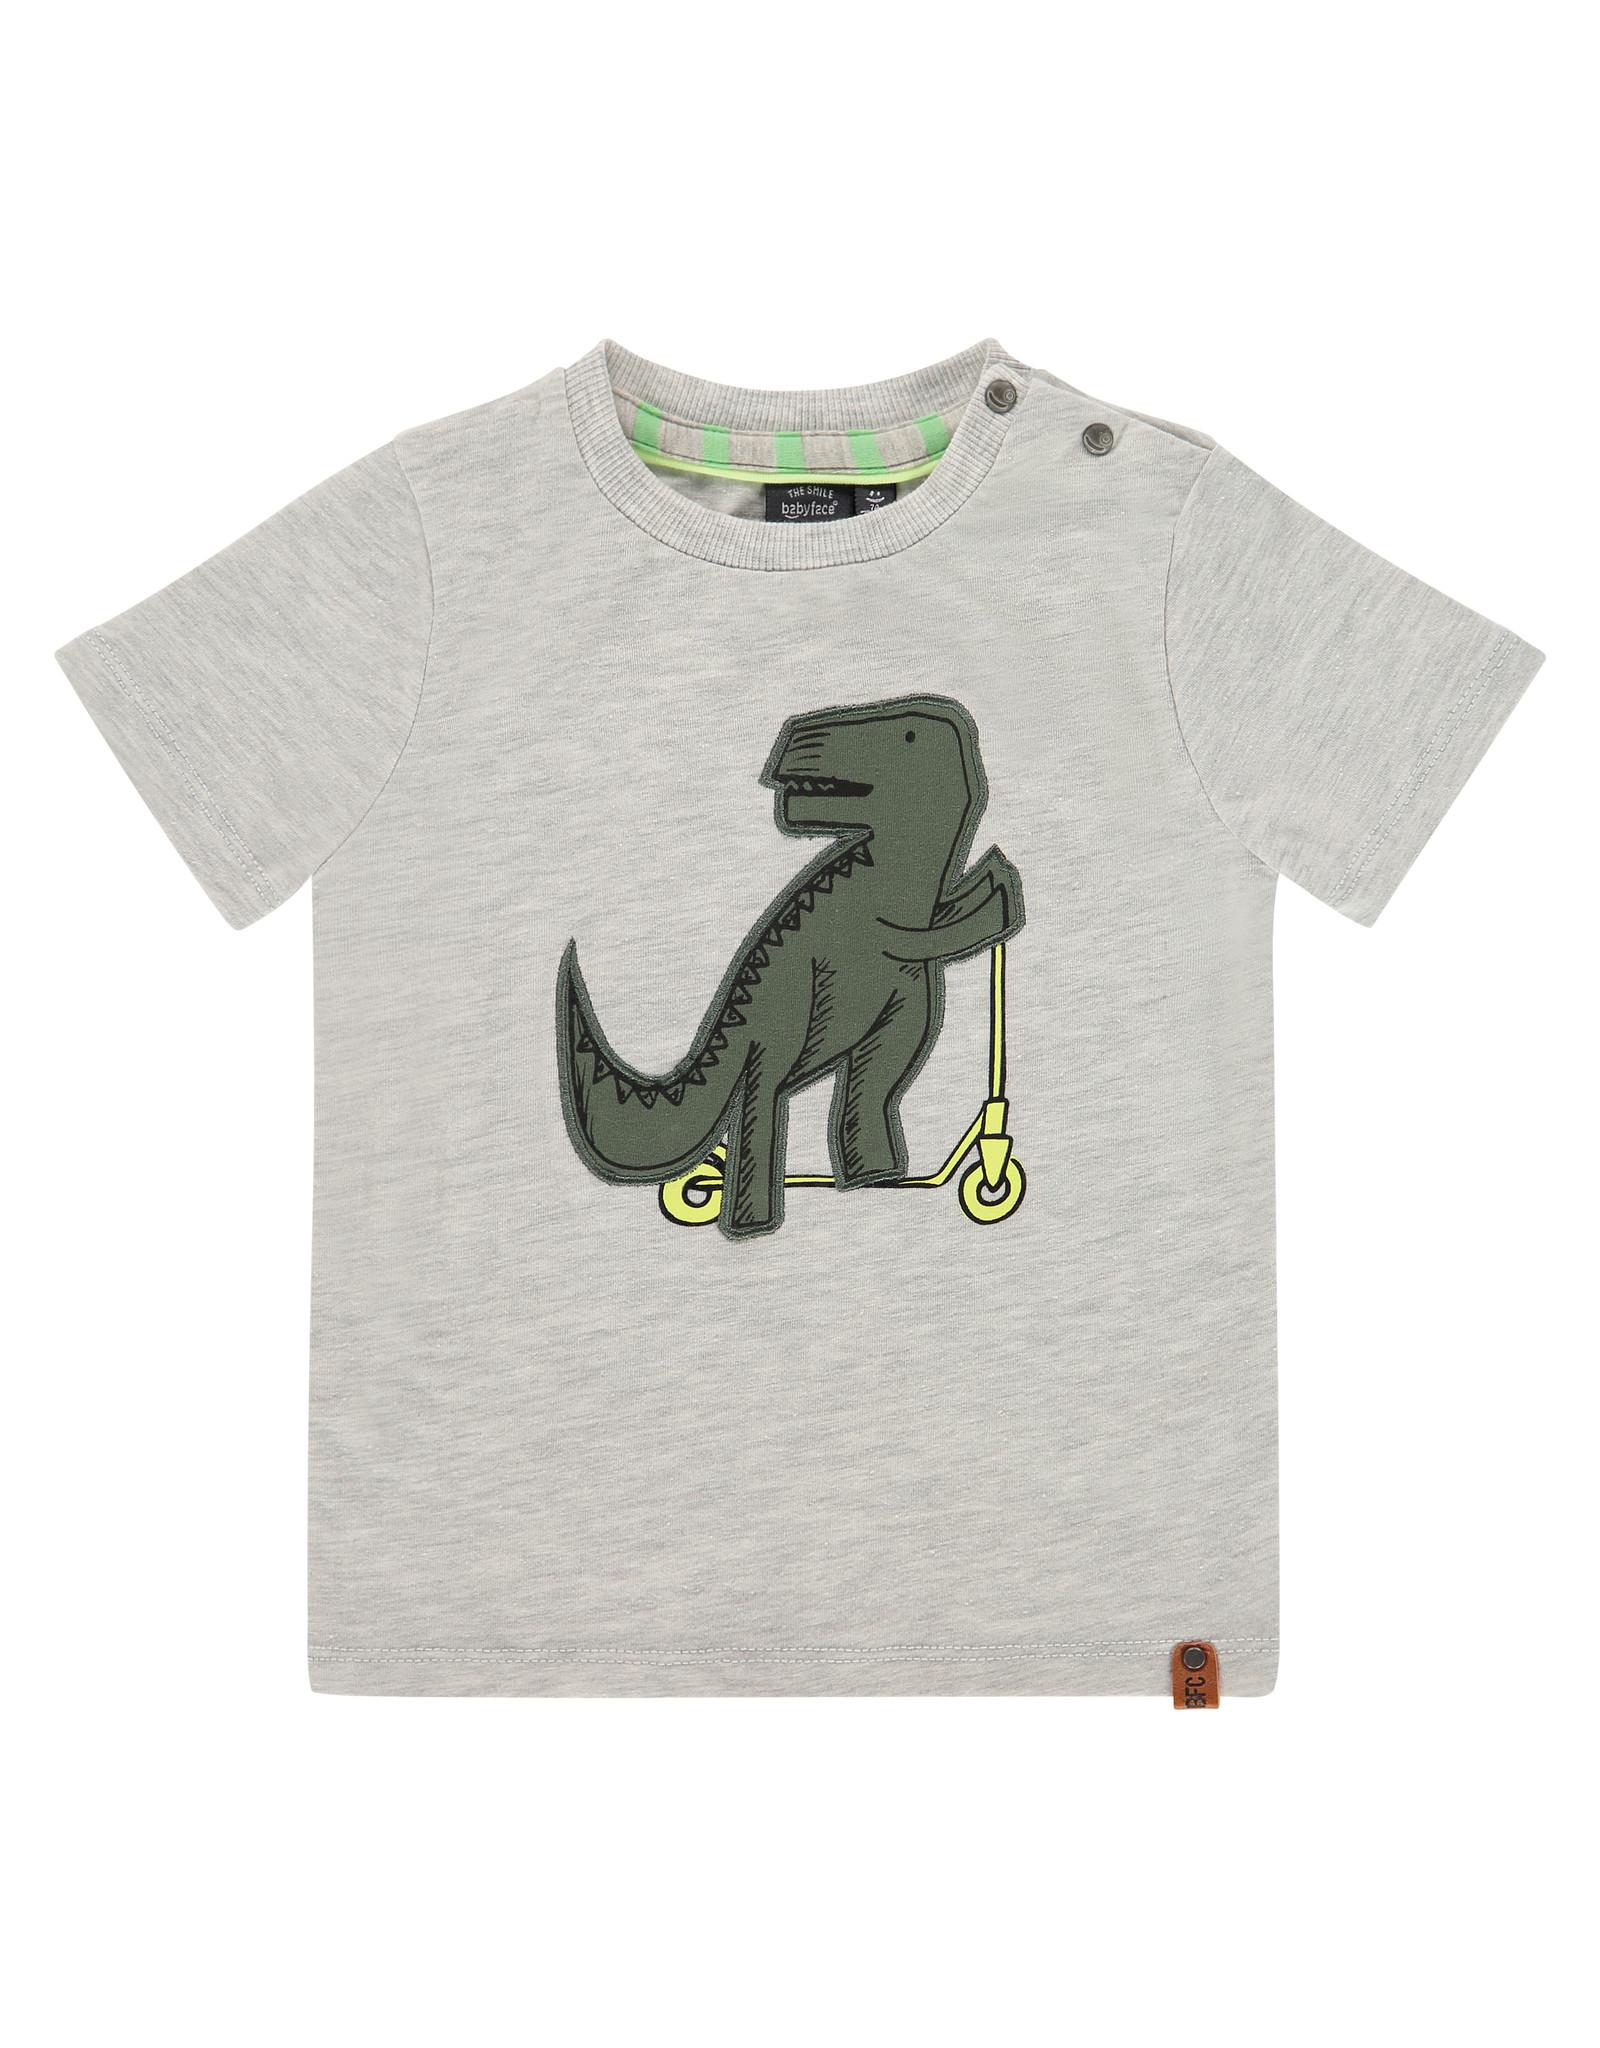 Babyface boys t-shirt short sleeve, light grey melee, BBE21107615